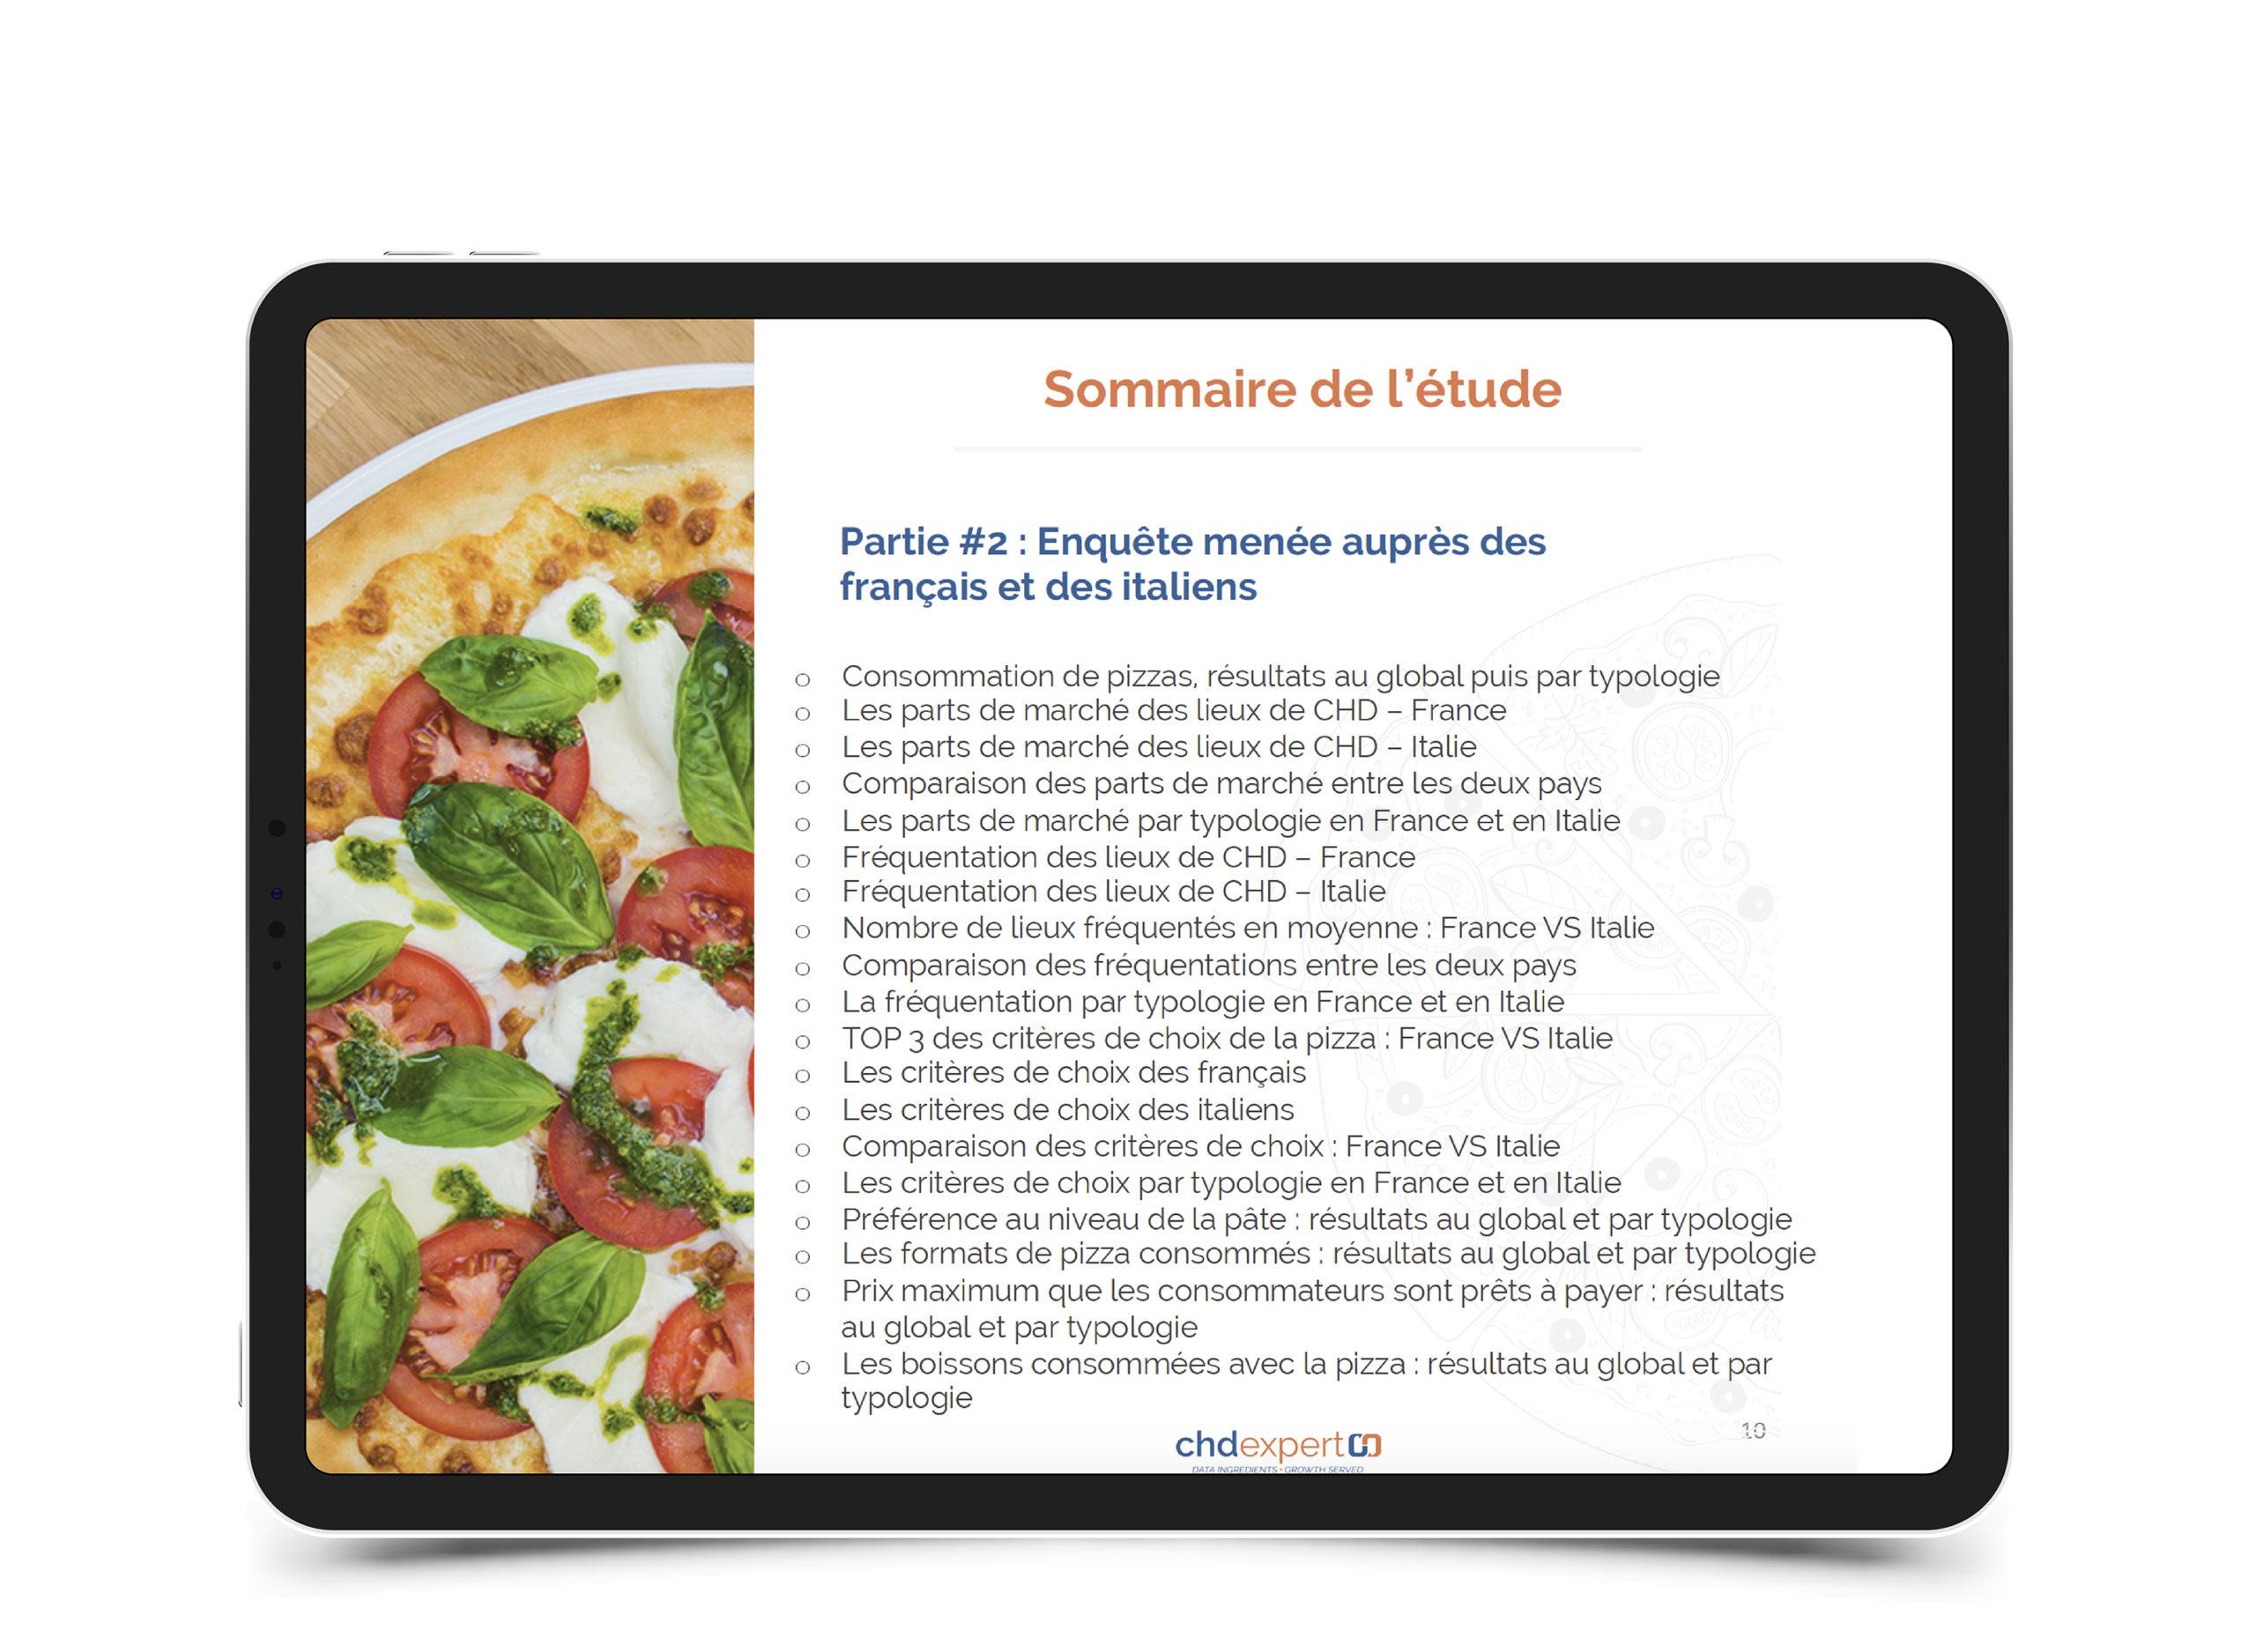 La pizza en France et en Italie • 2019